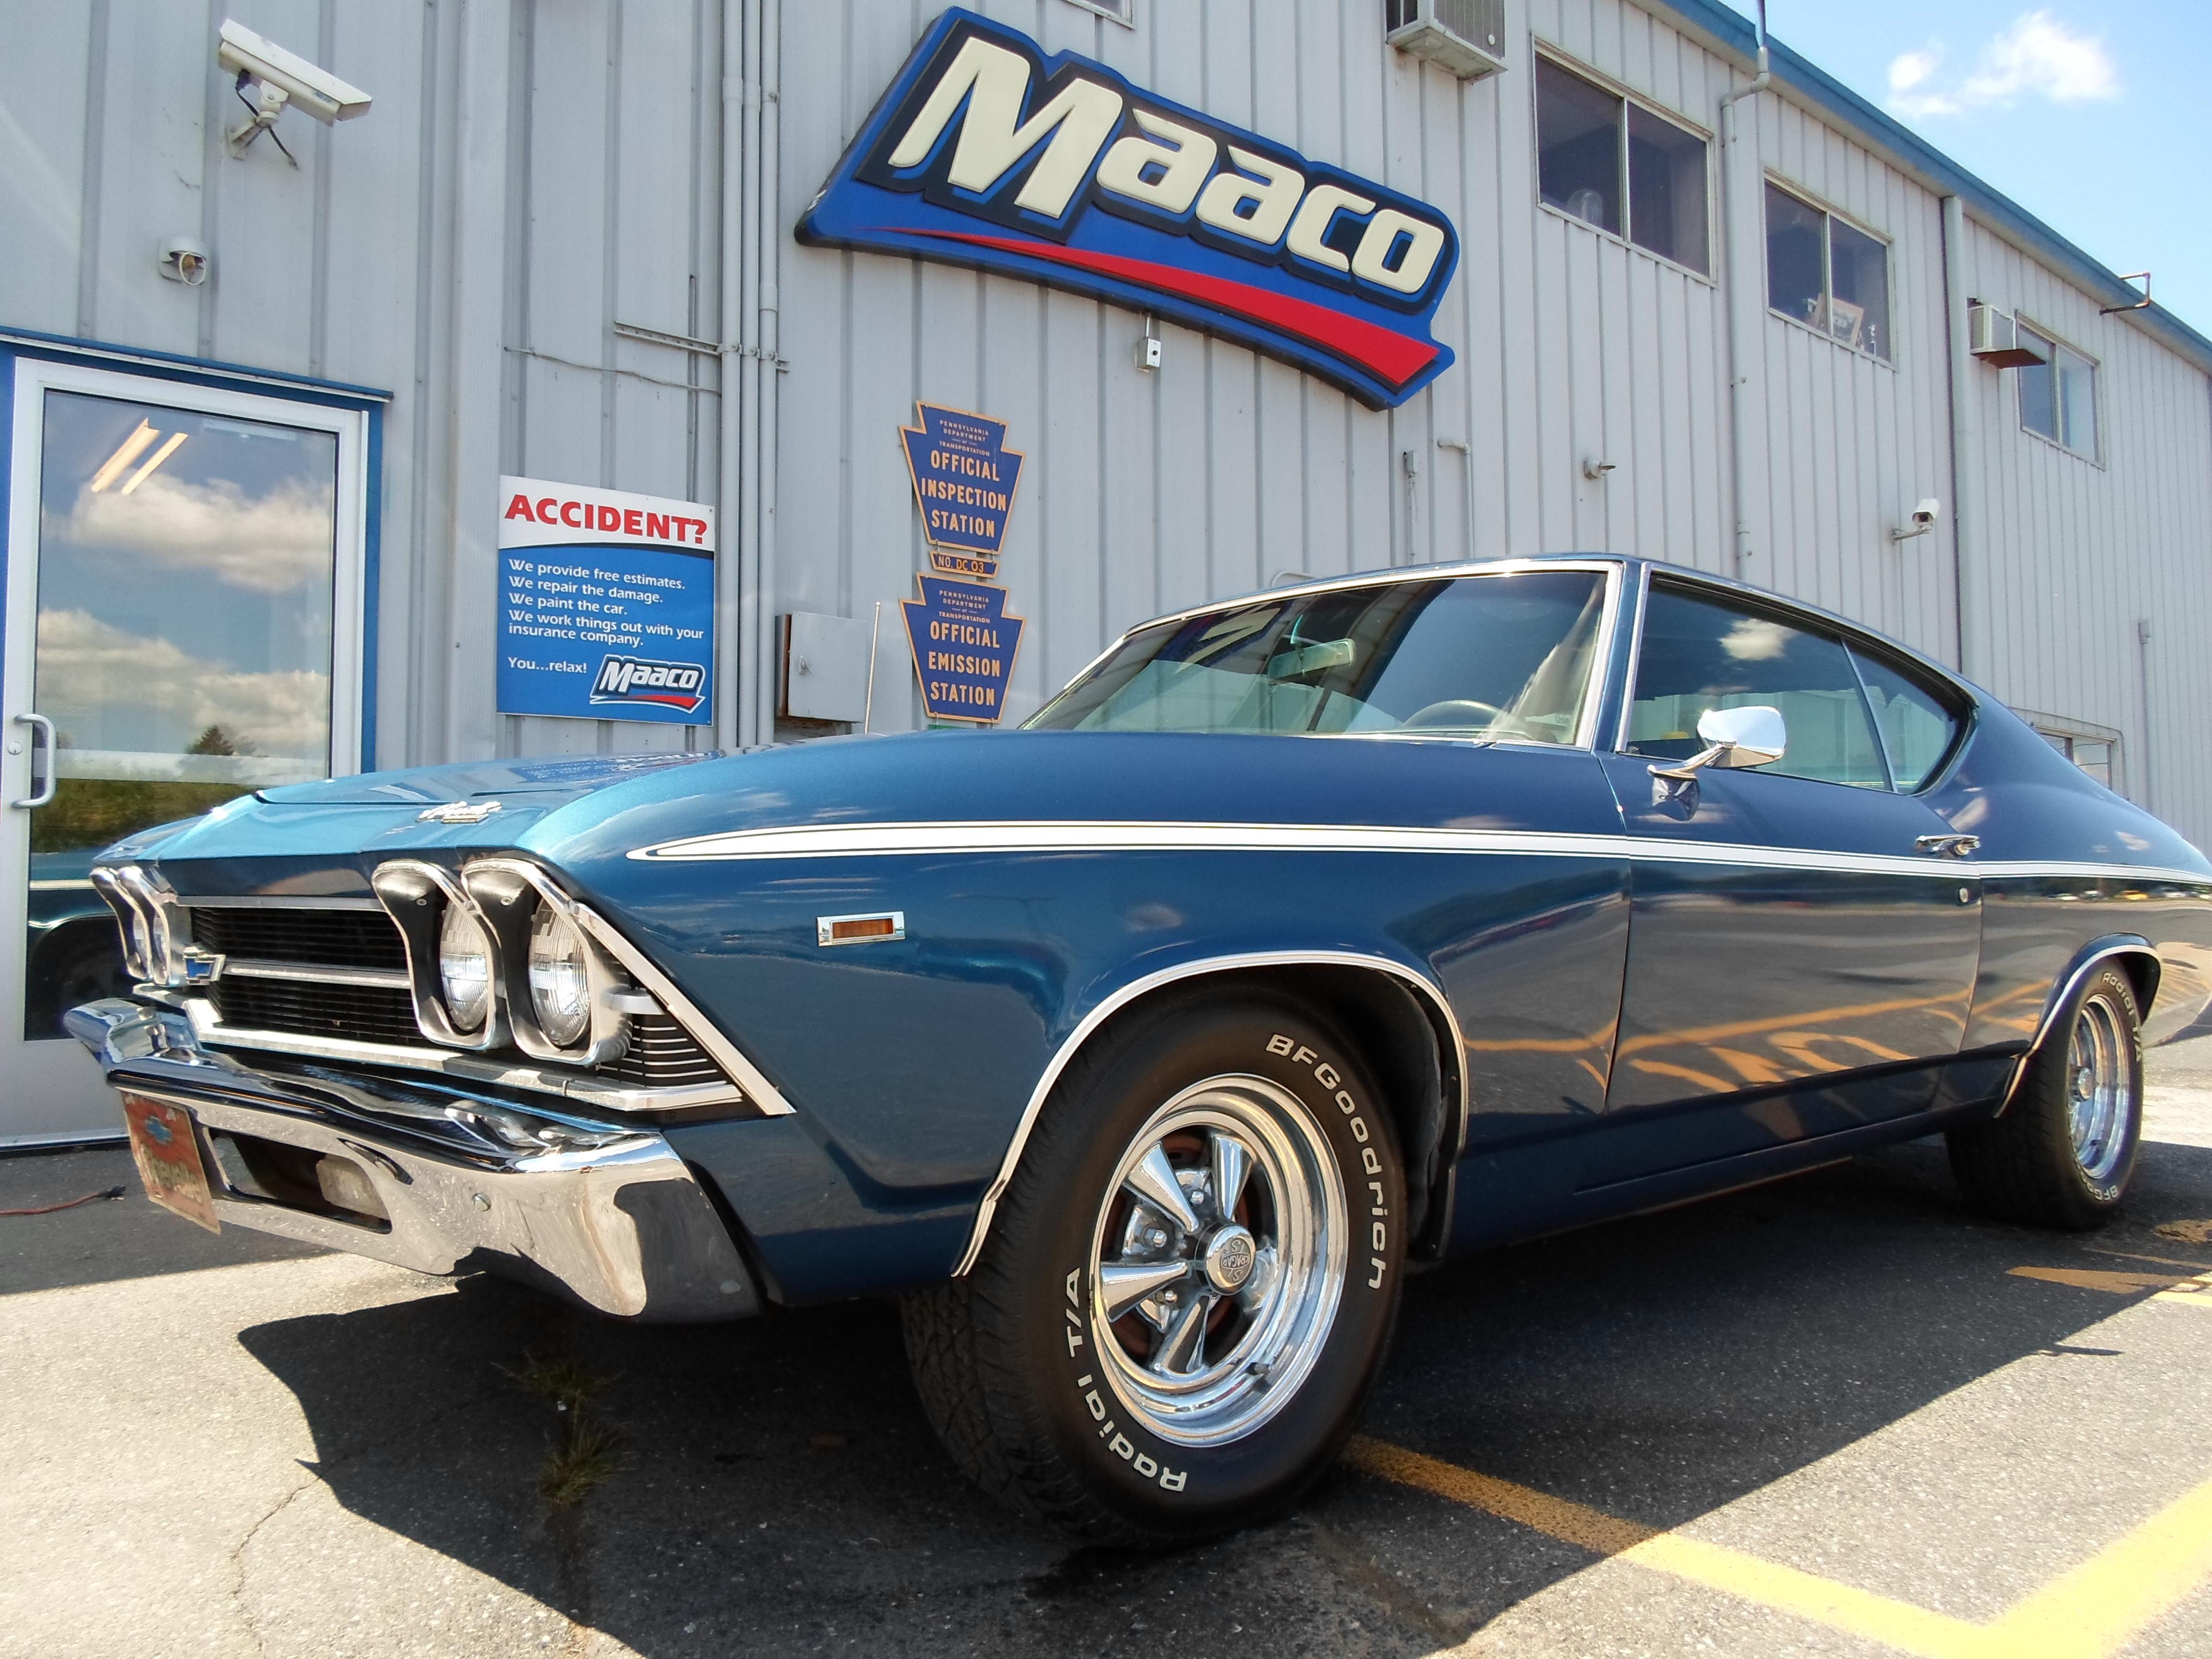 Maaco Collision Repair & Auto Painting image 17